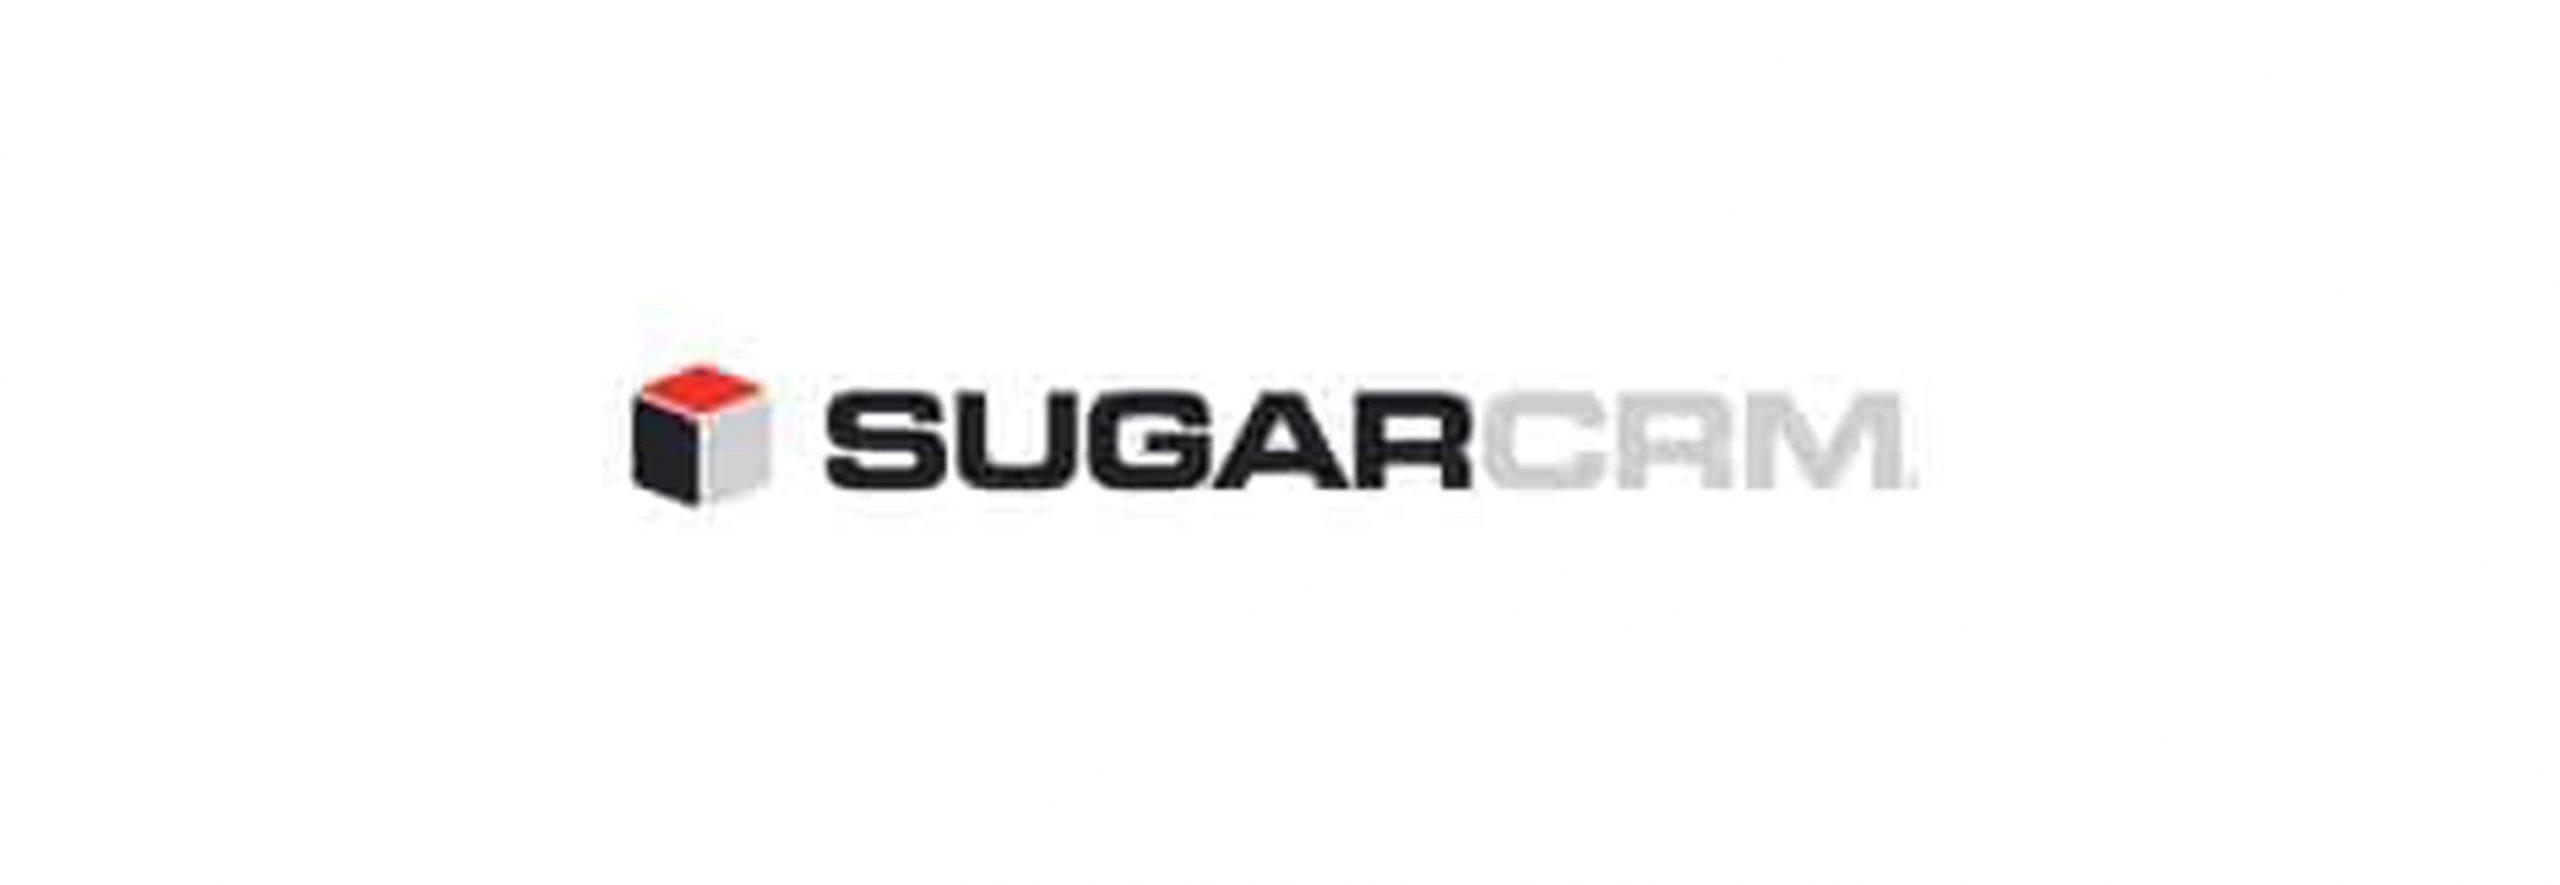 sugarcrm-min